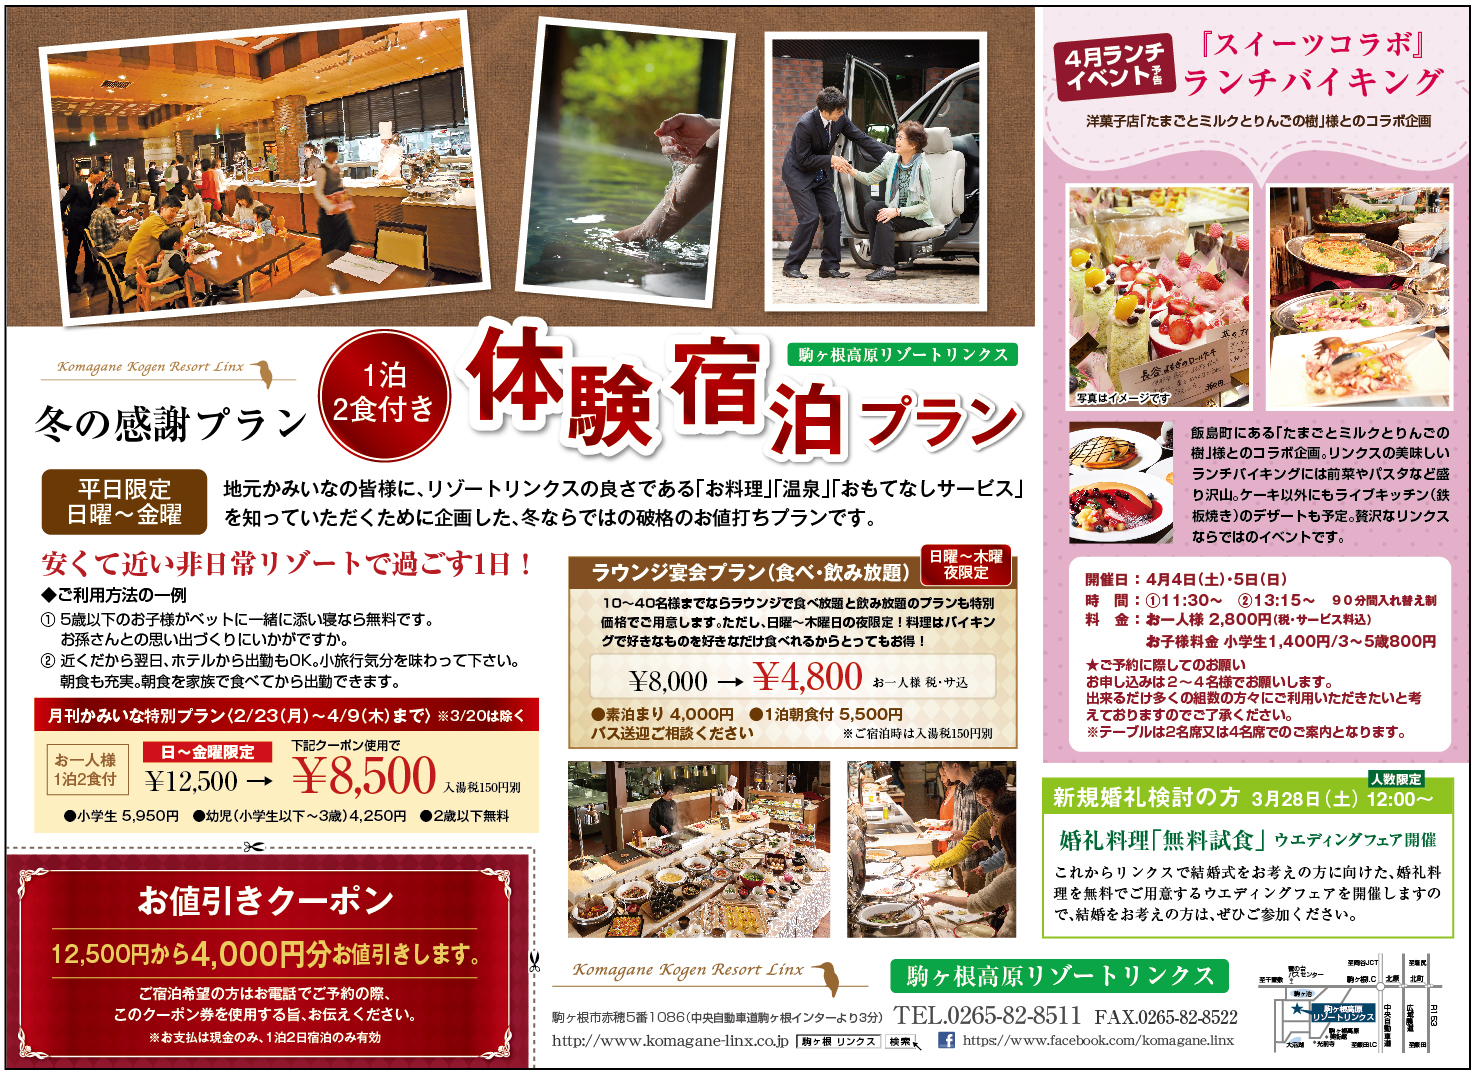 http://www.komagane-linx.co.jp/kamiina1503.jpg